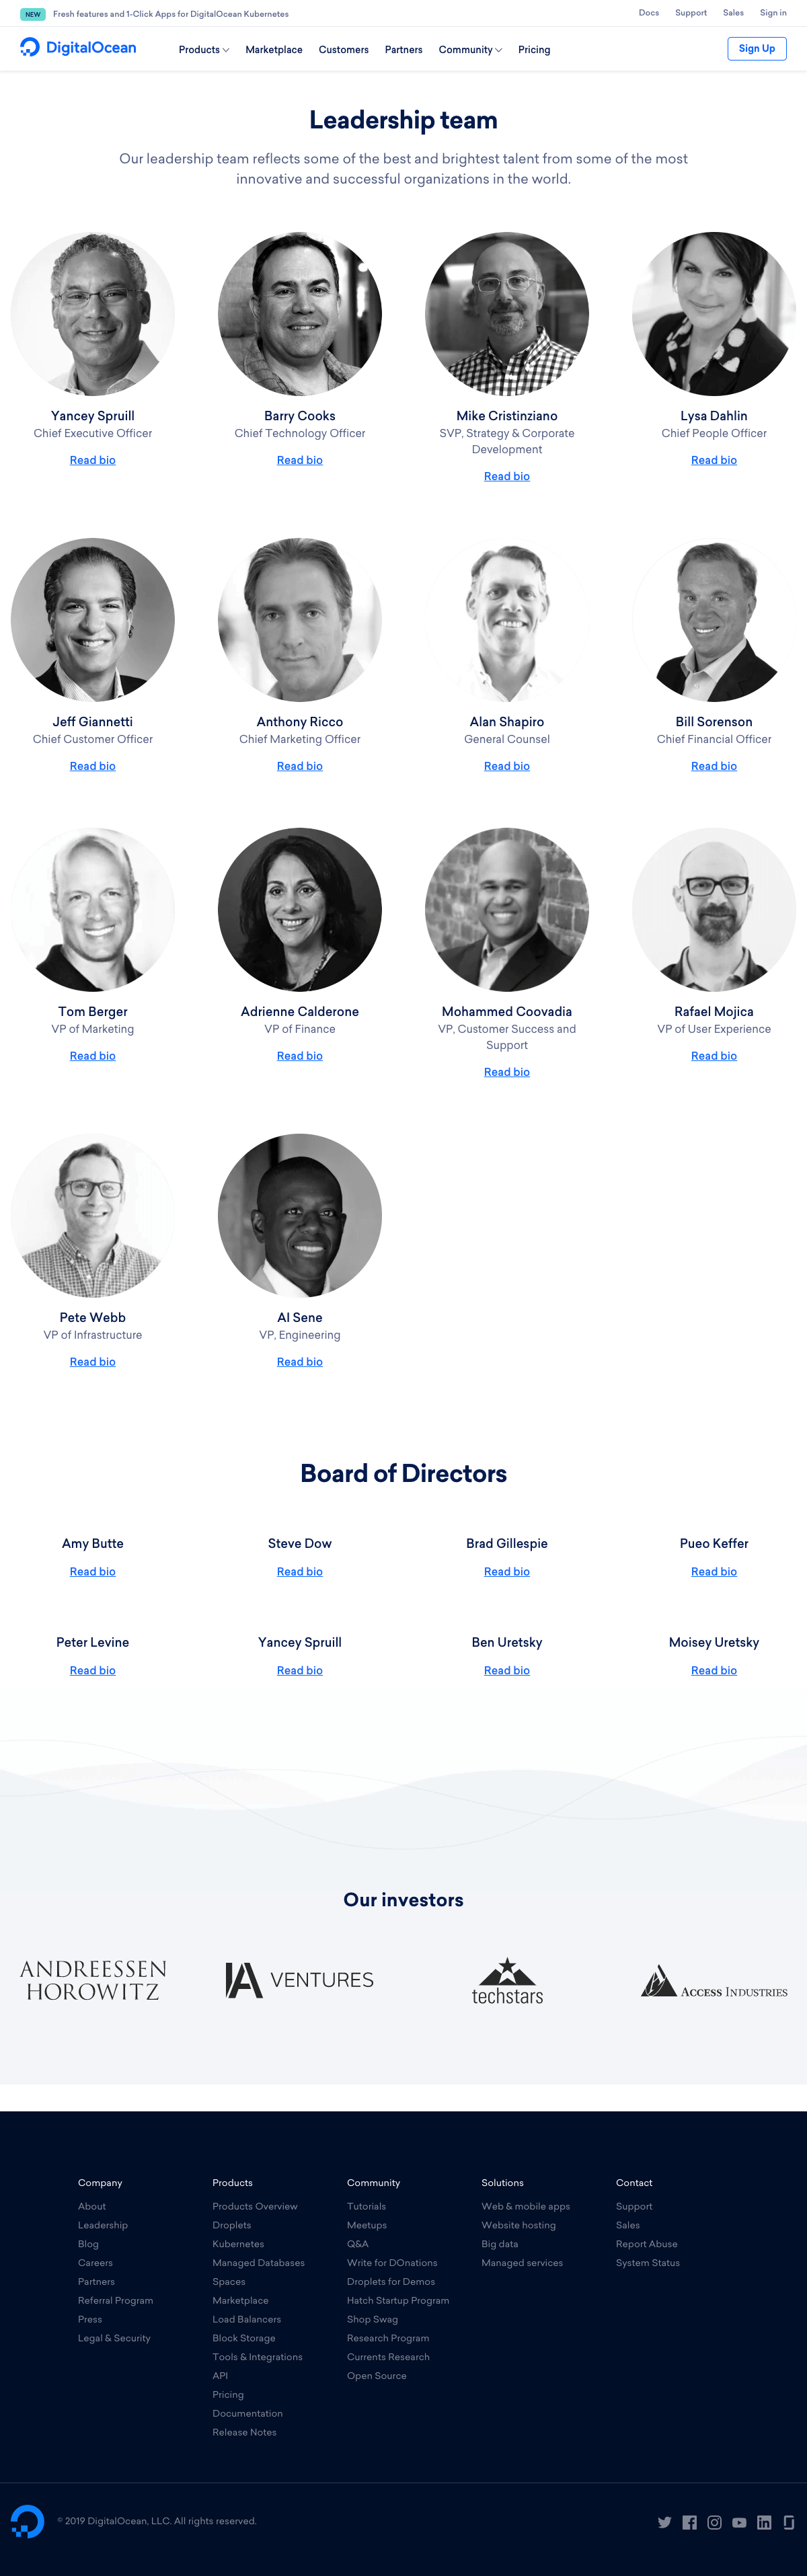 DigitalOcean - Team page